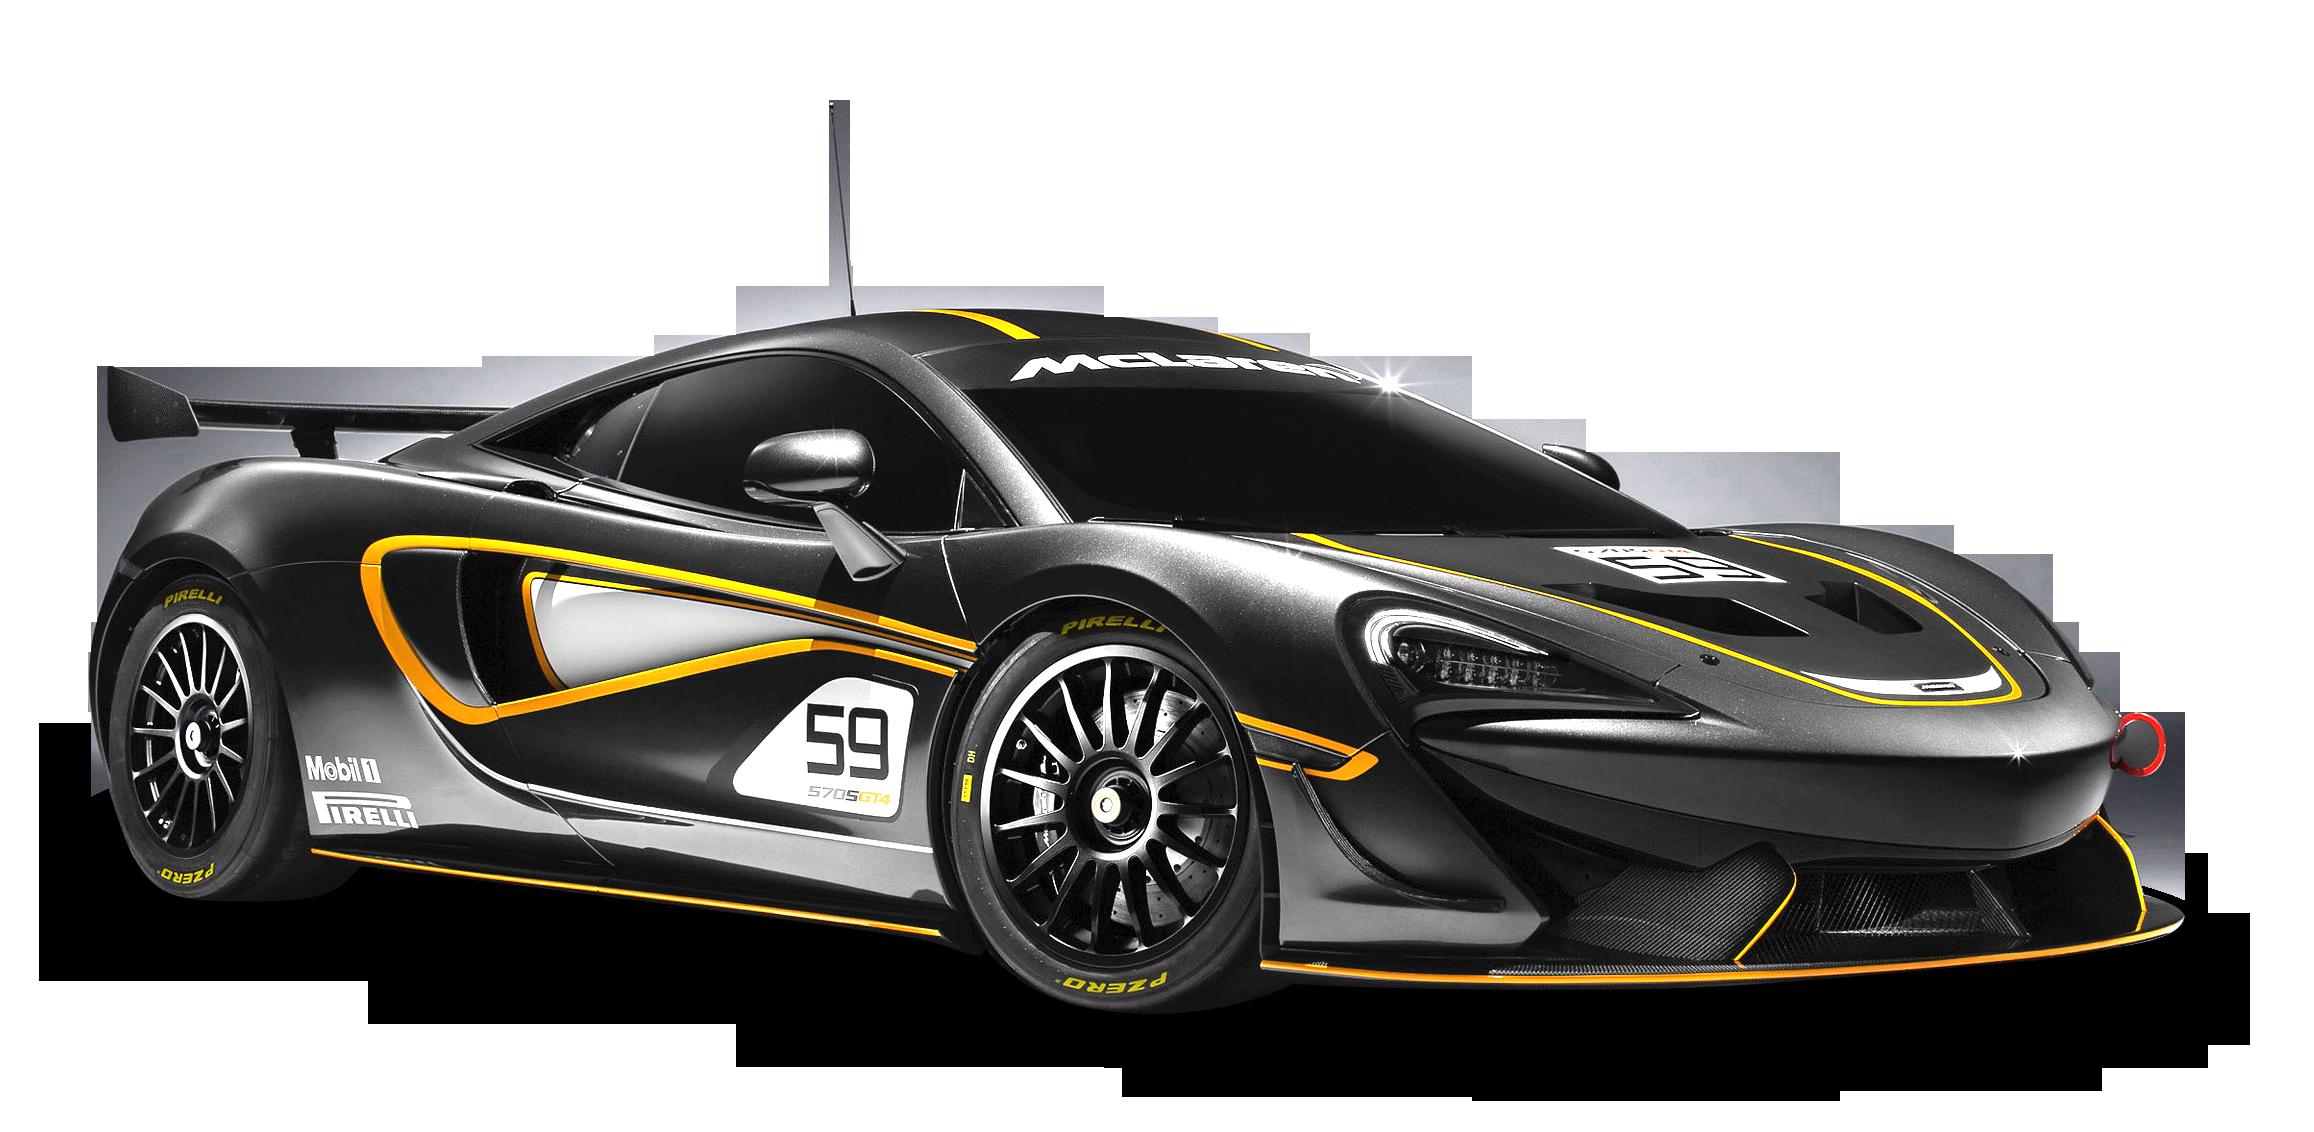 Download Black McLaren 570S GT4 Racing Car PNG Image for